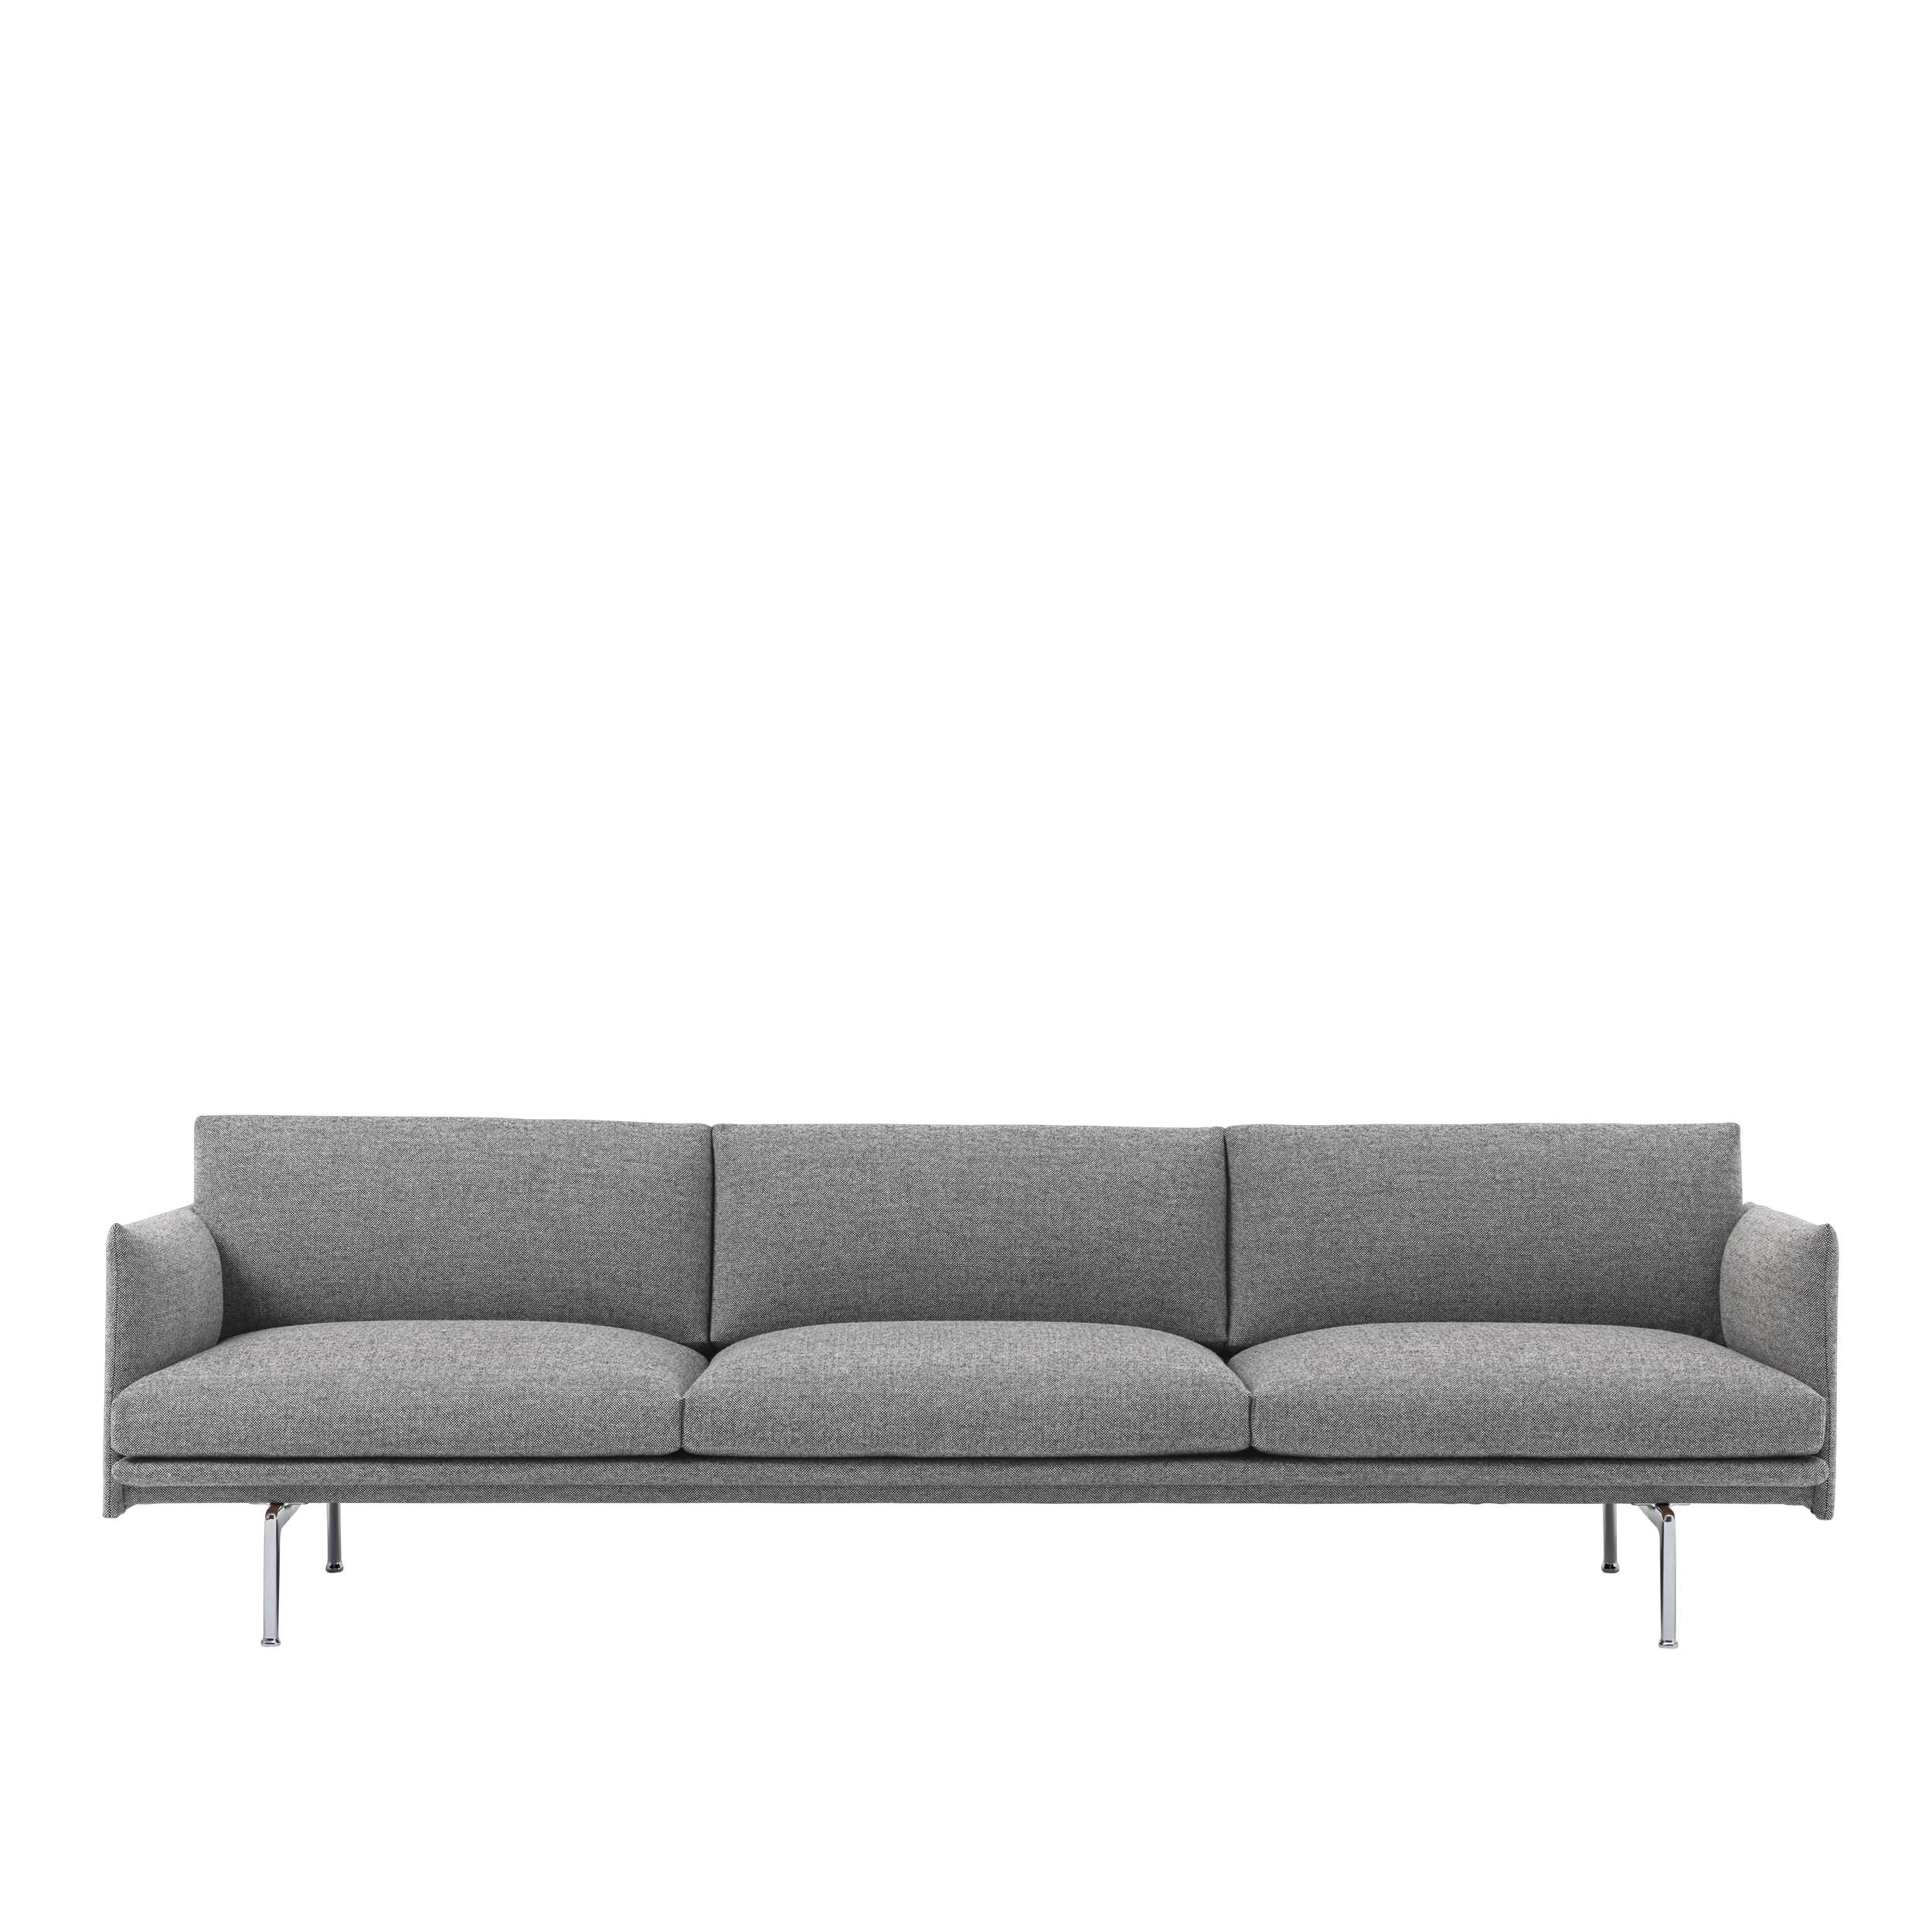 Outline Sofa 3 1/2 seater – Polished Aluminum Base